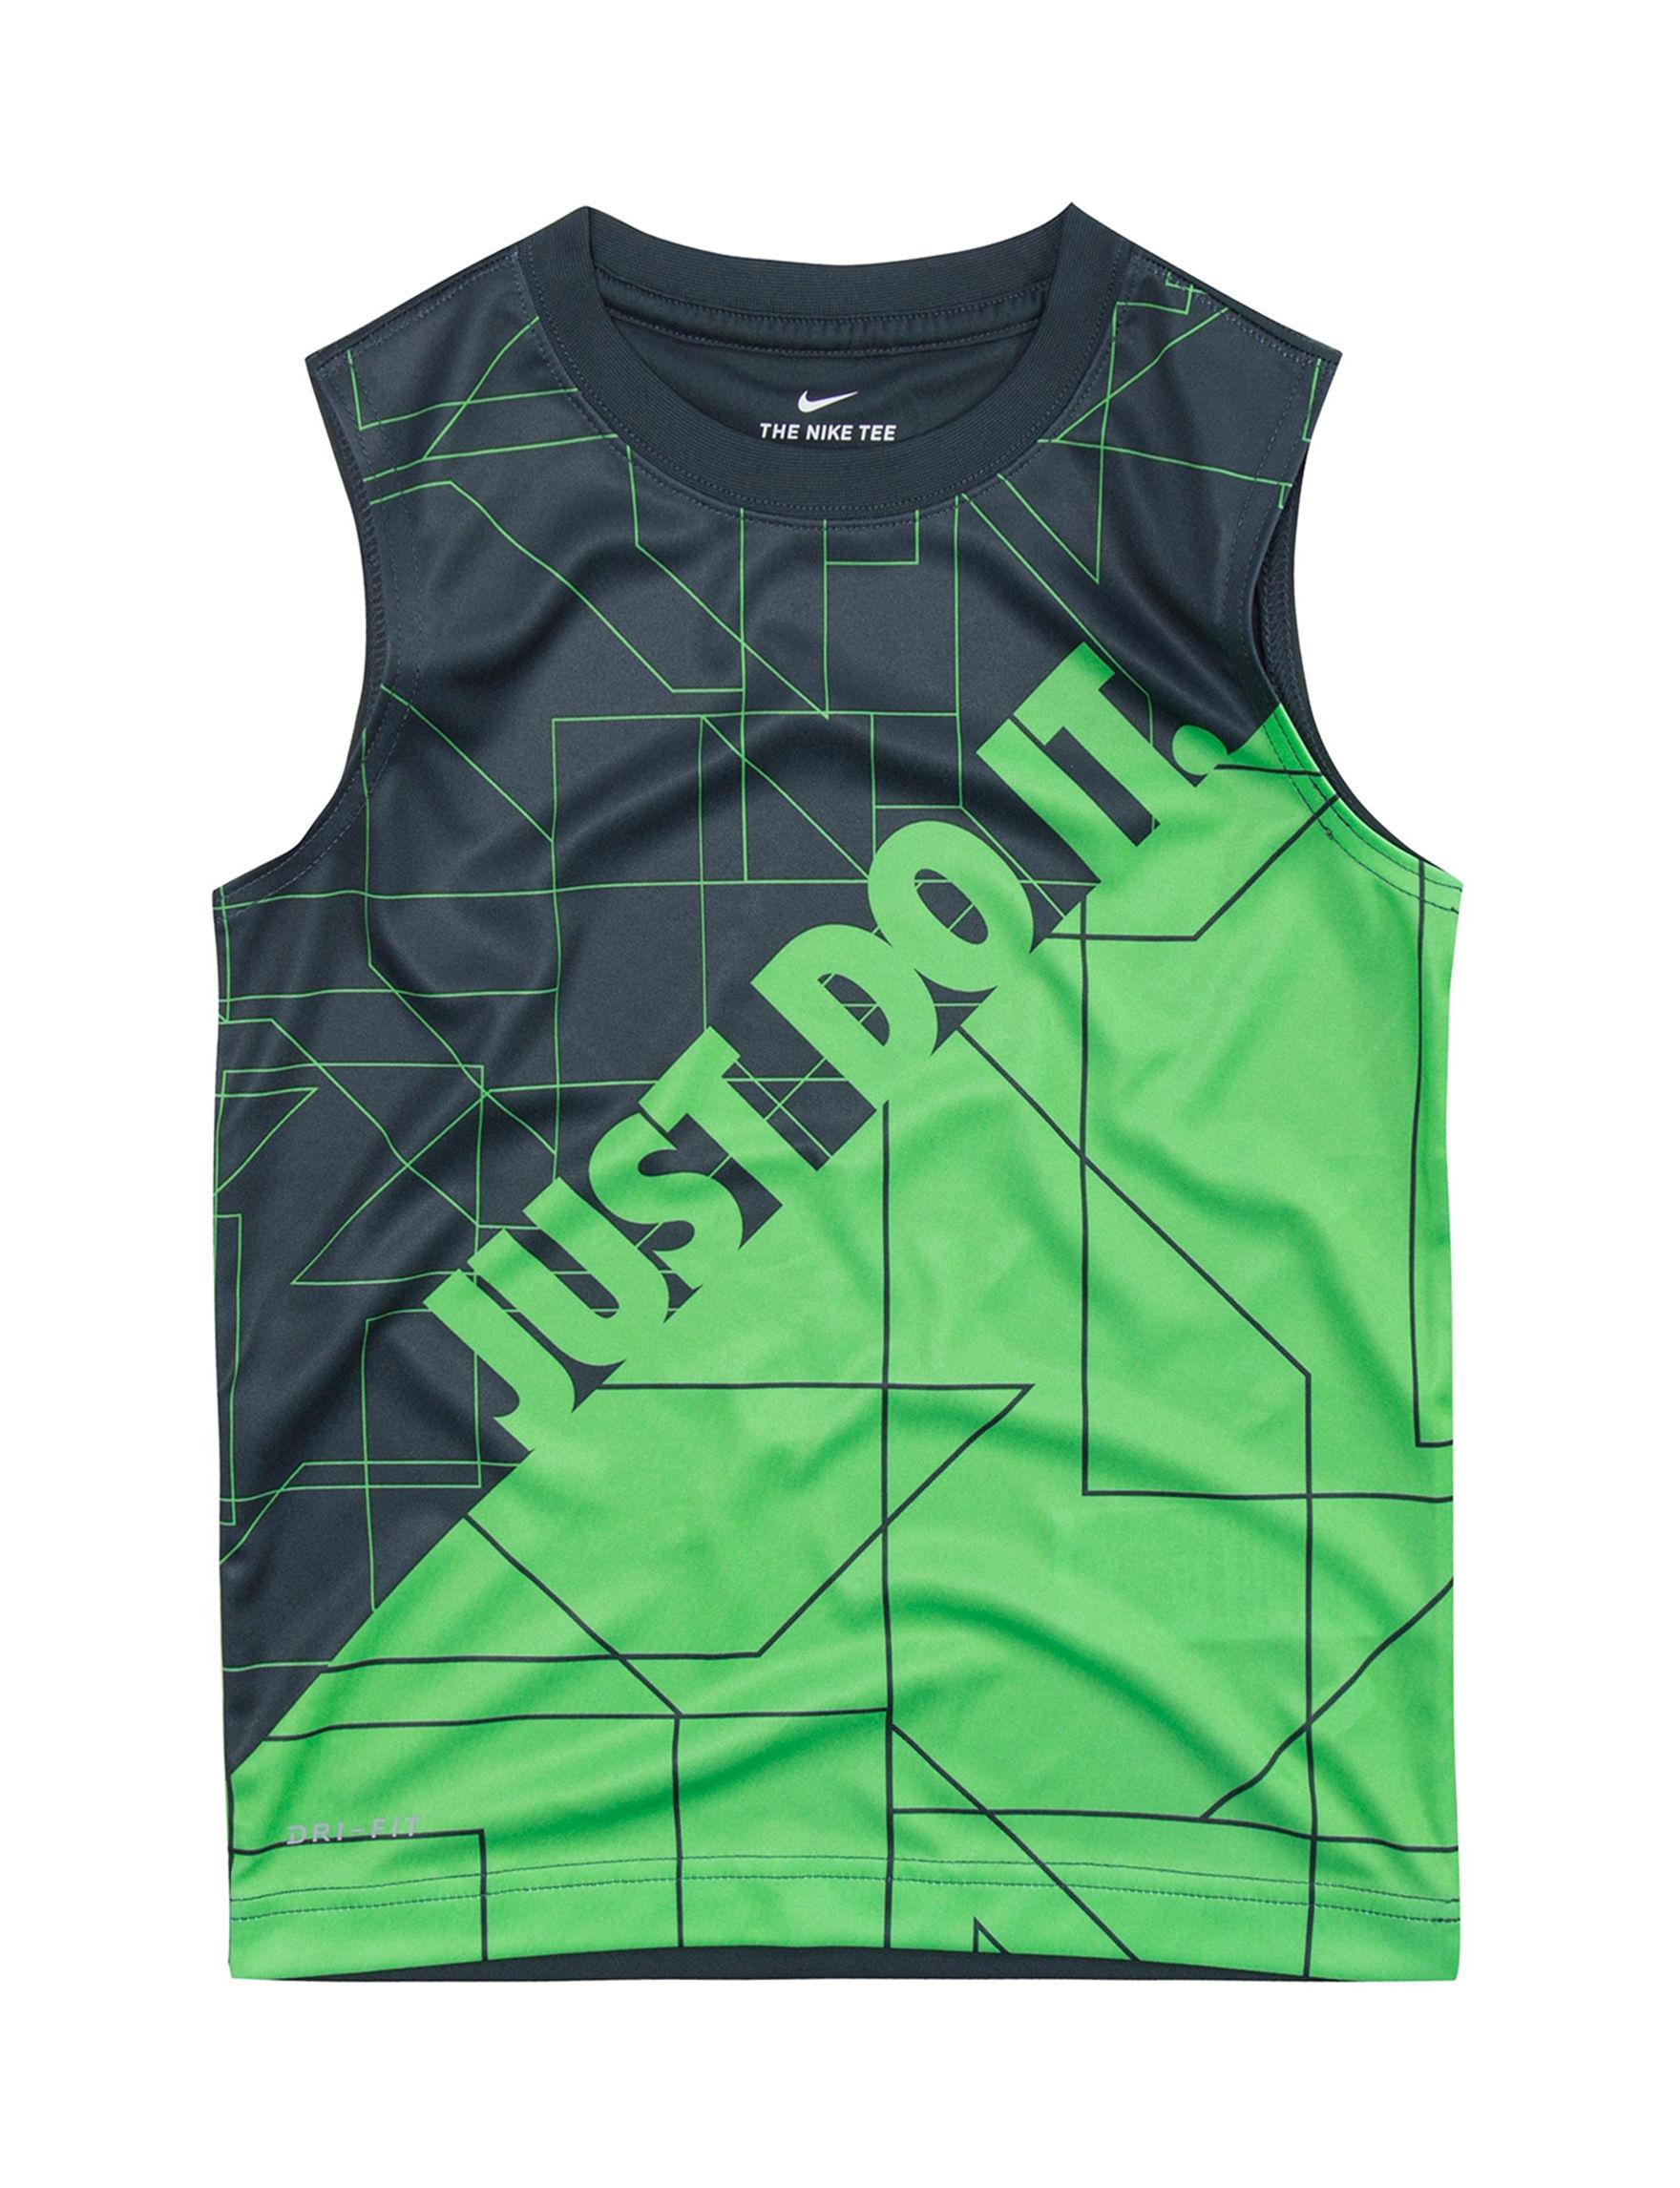 Nike Green / Navy Tees & Tanks